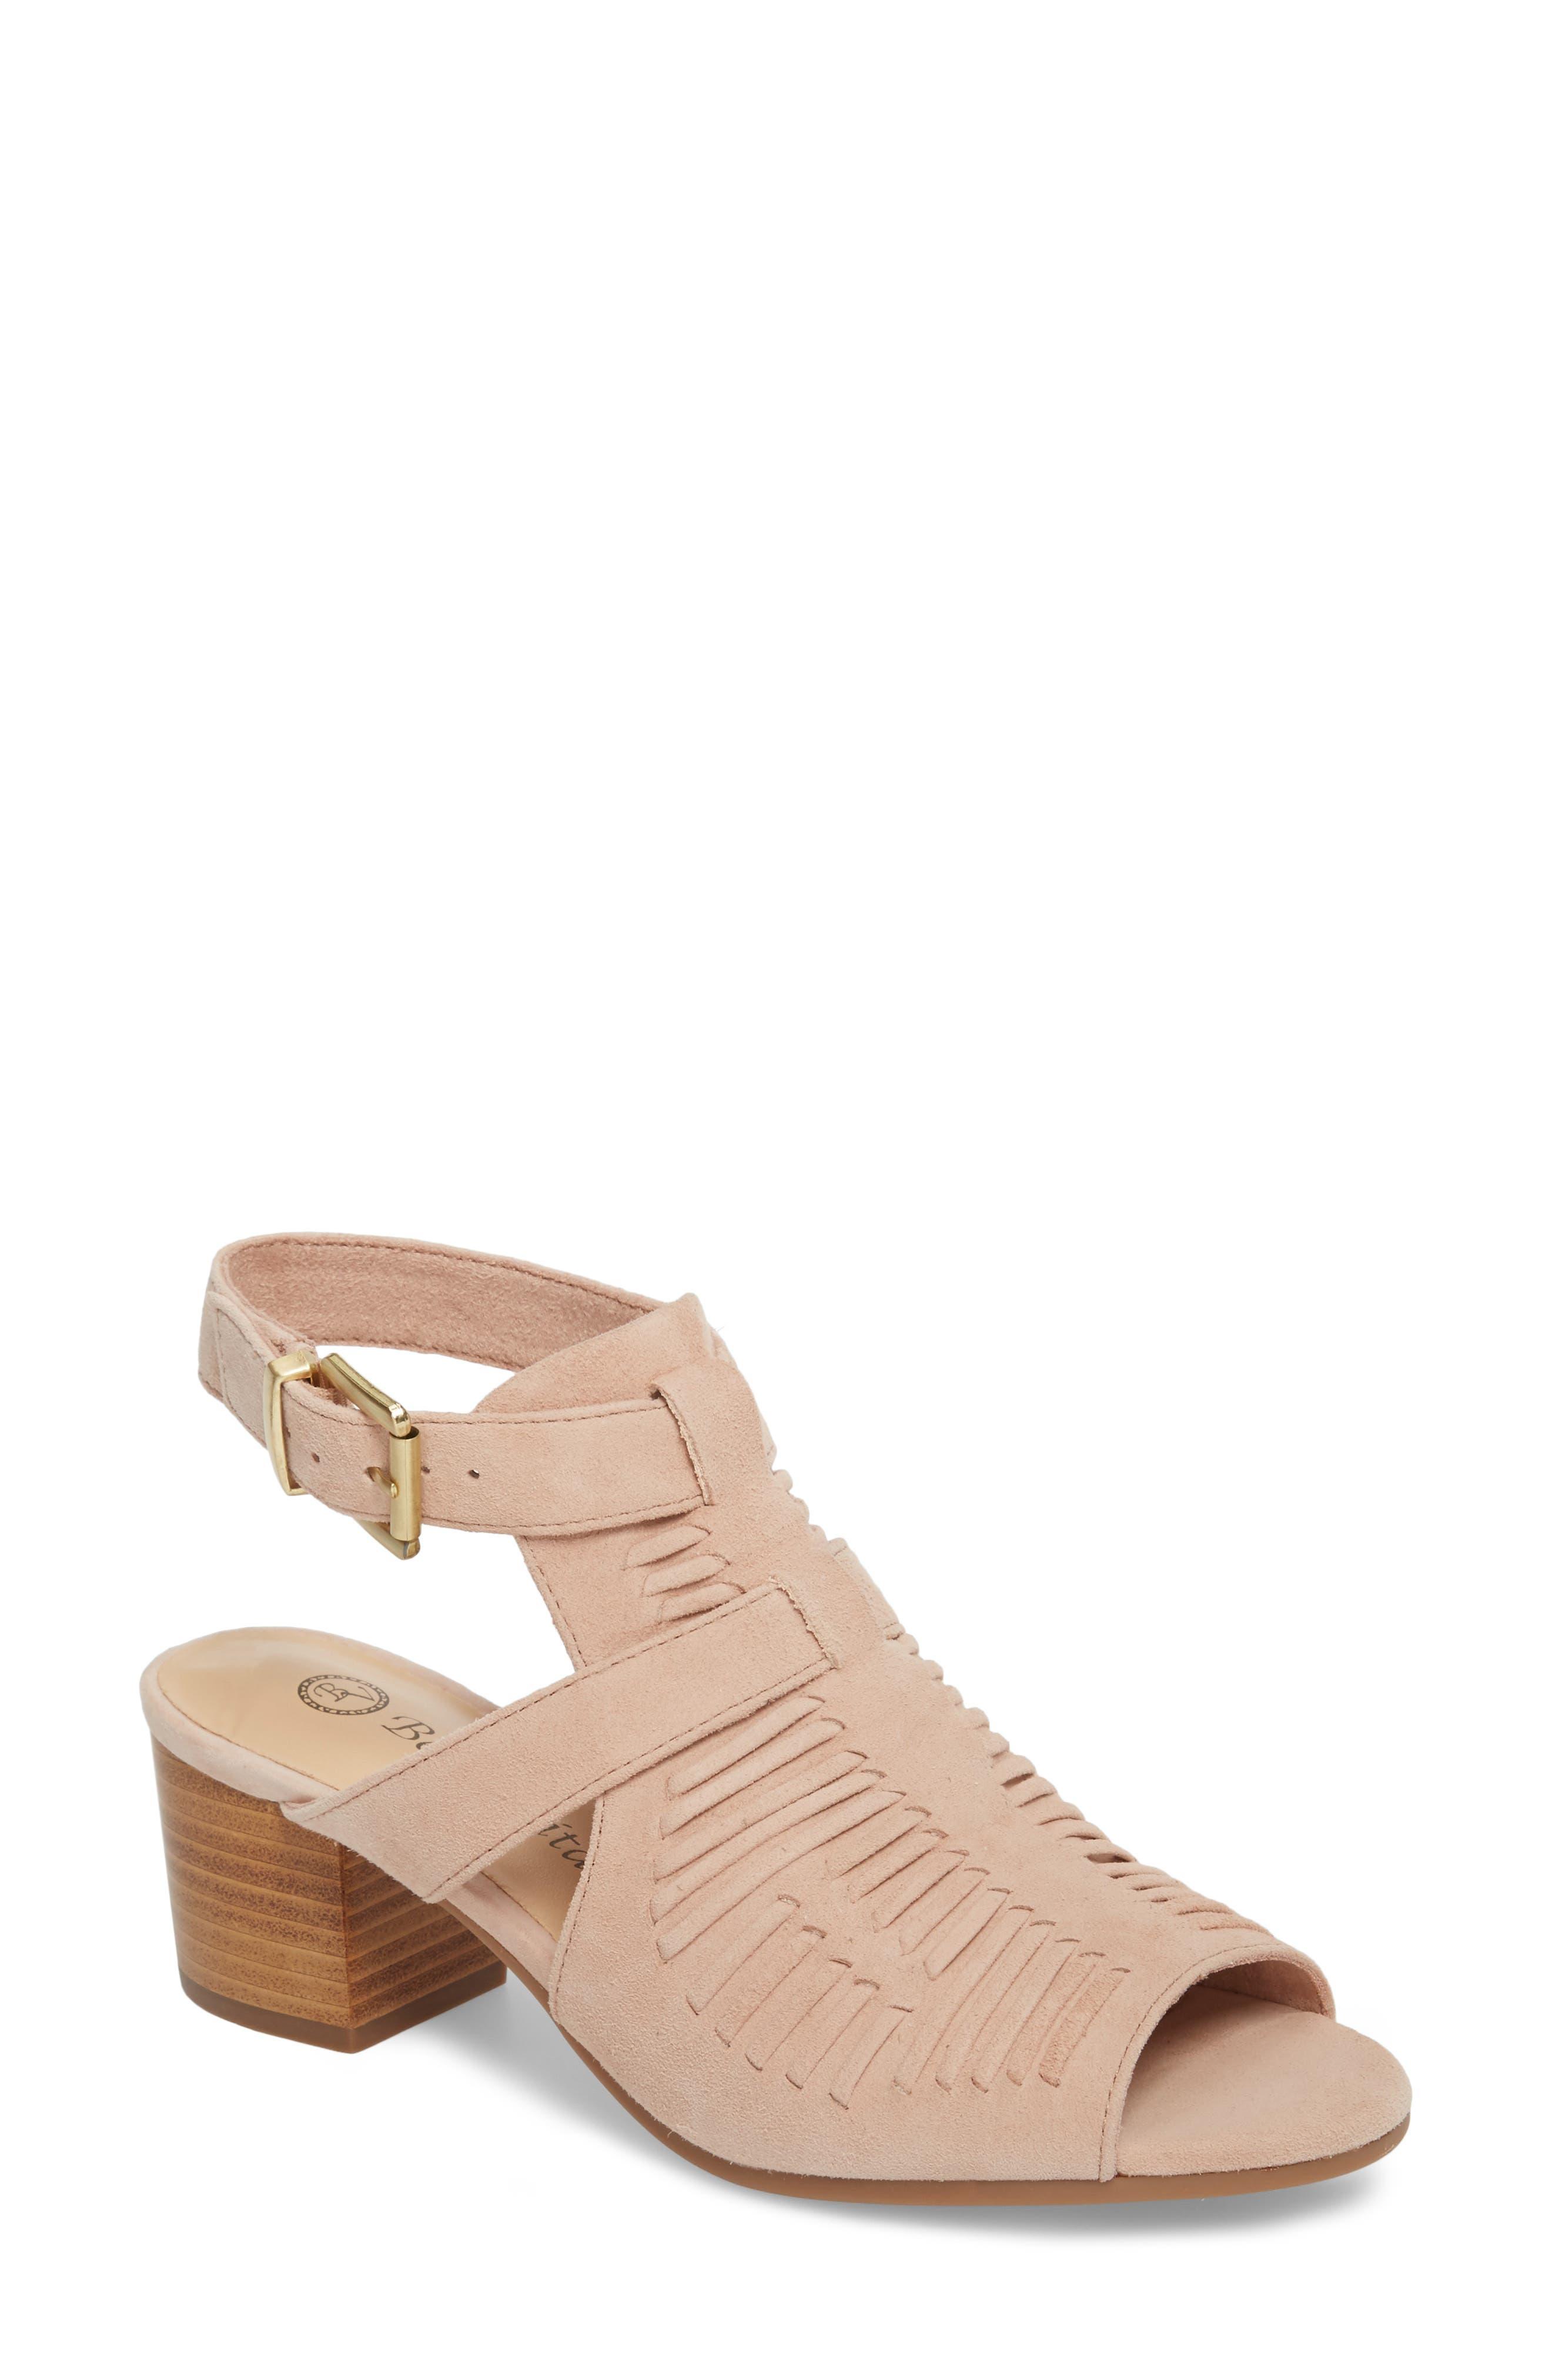 Finley Ankle Strap Sandal,                             Main thumbnail 5, color,